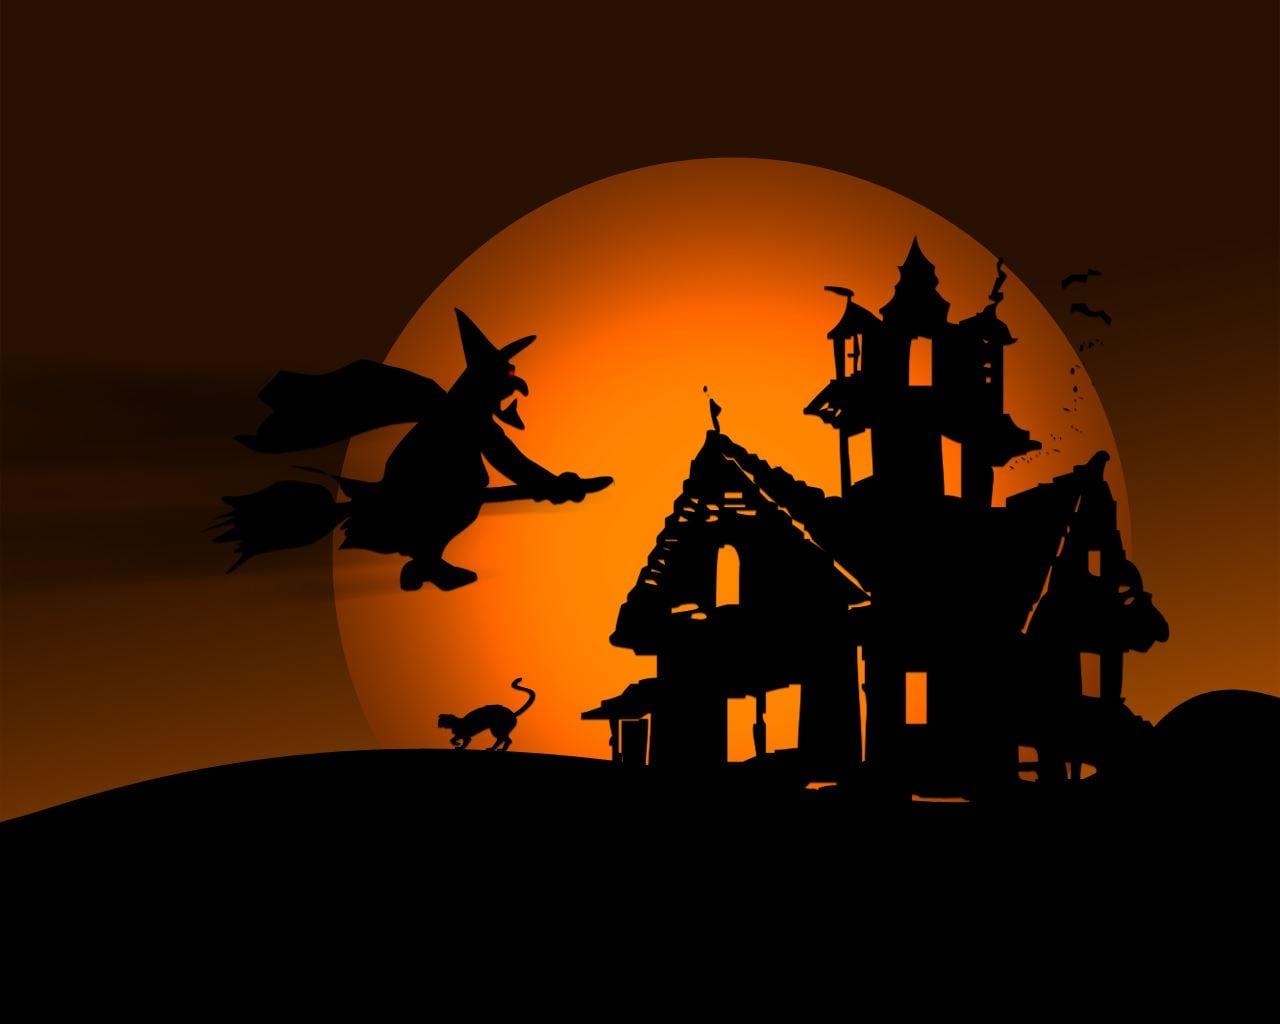 Wonderful Wallpaper Halloween Windows 7 - halloween-wallpaper11  Graphic_481672.jpg